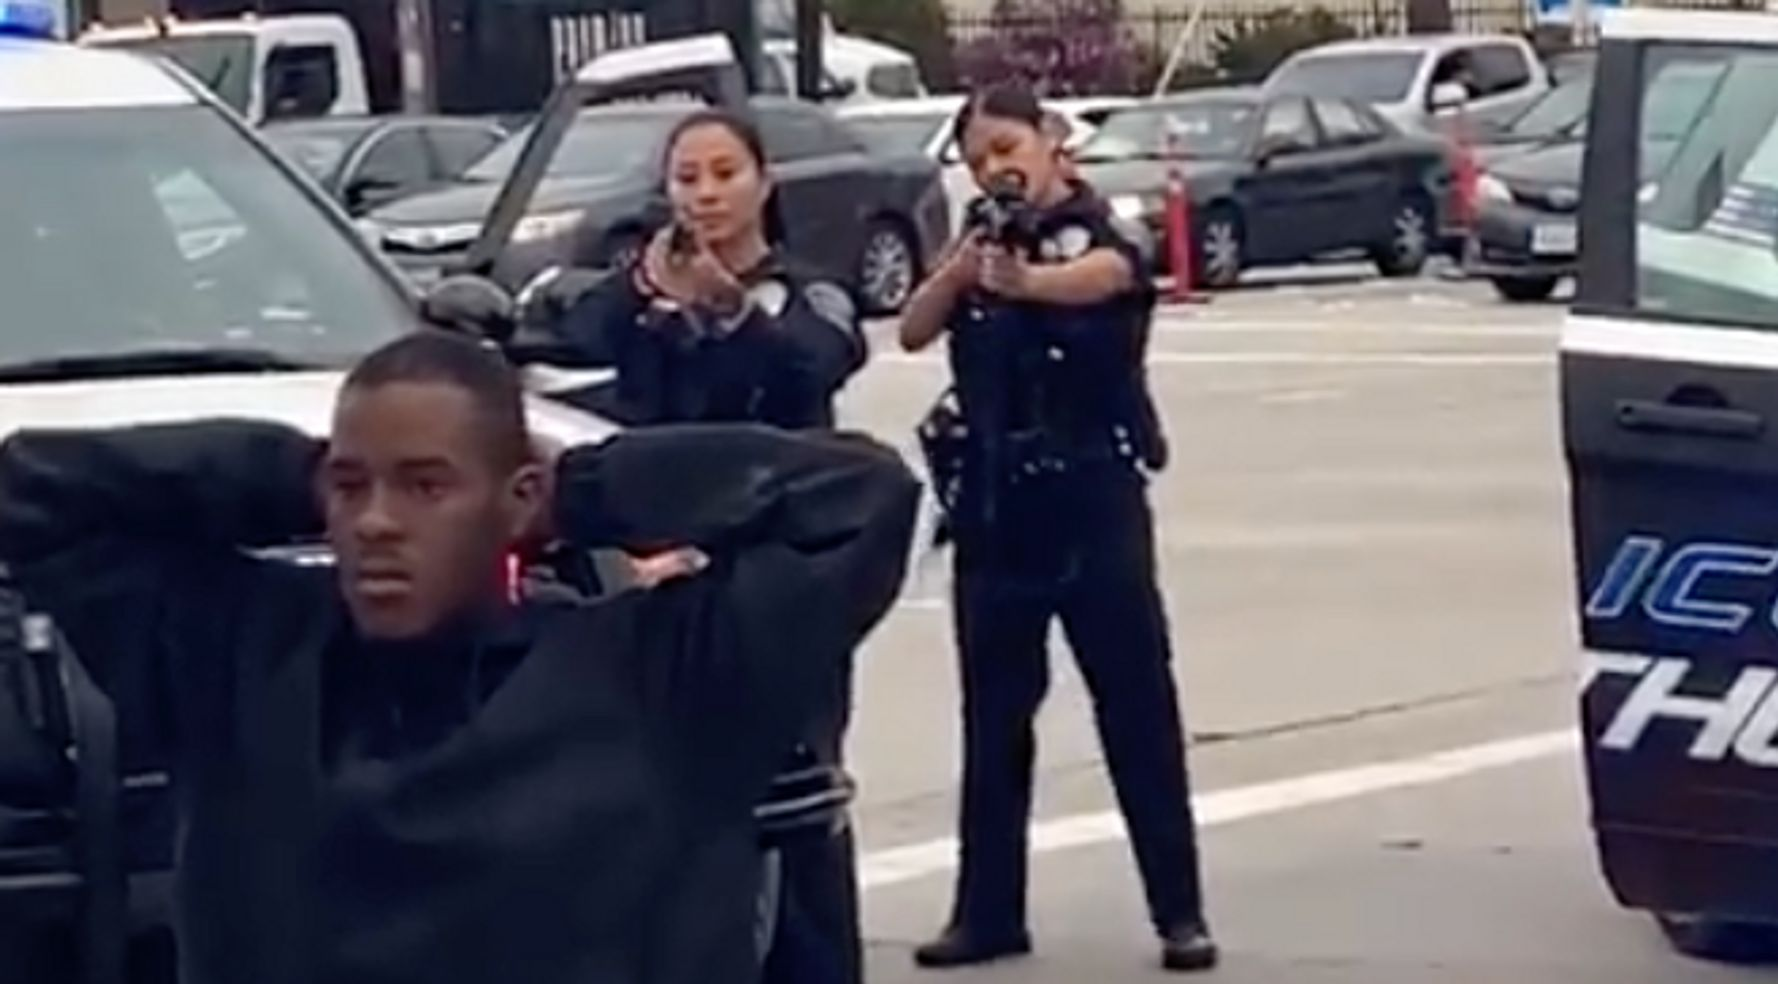 Woman's Video Of Police Aiming Guns At Kneeling Man Goes Viral